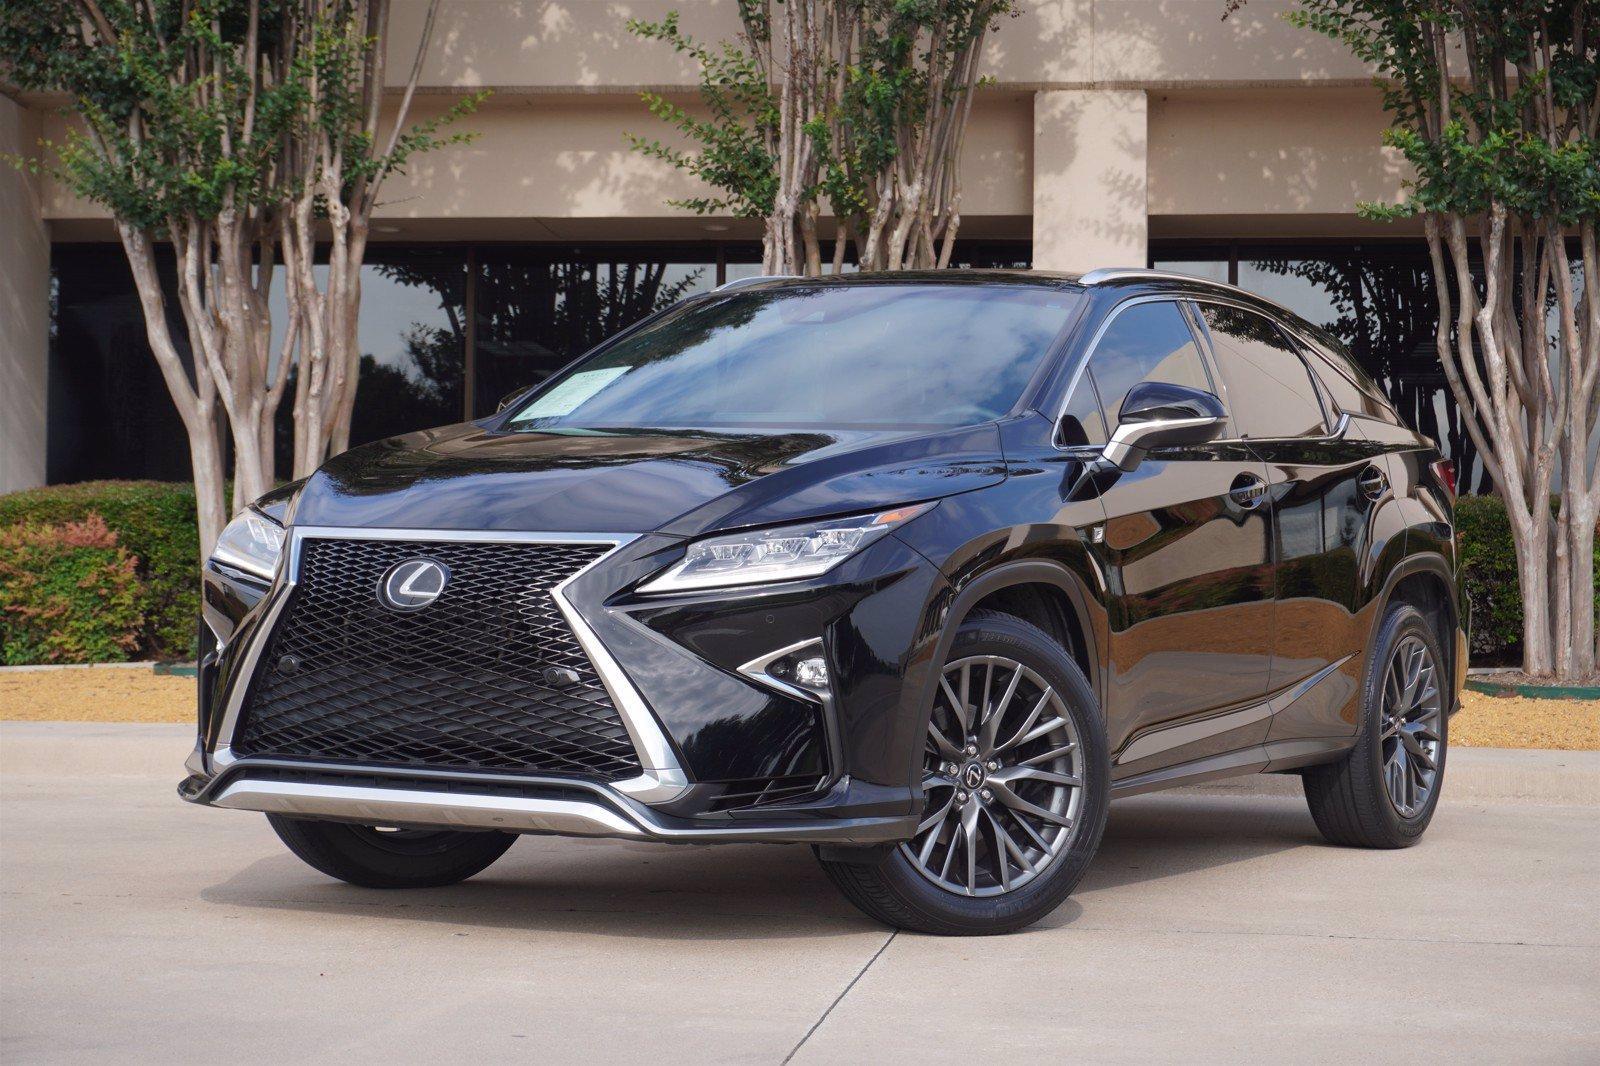 2017 Lexus RX 350 Vehicle Photo in Grapevine, TX 76051